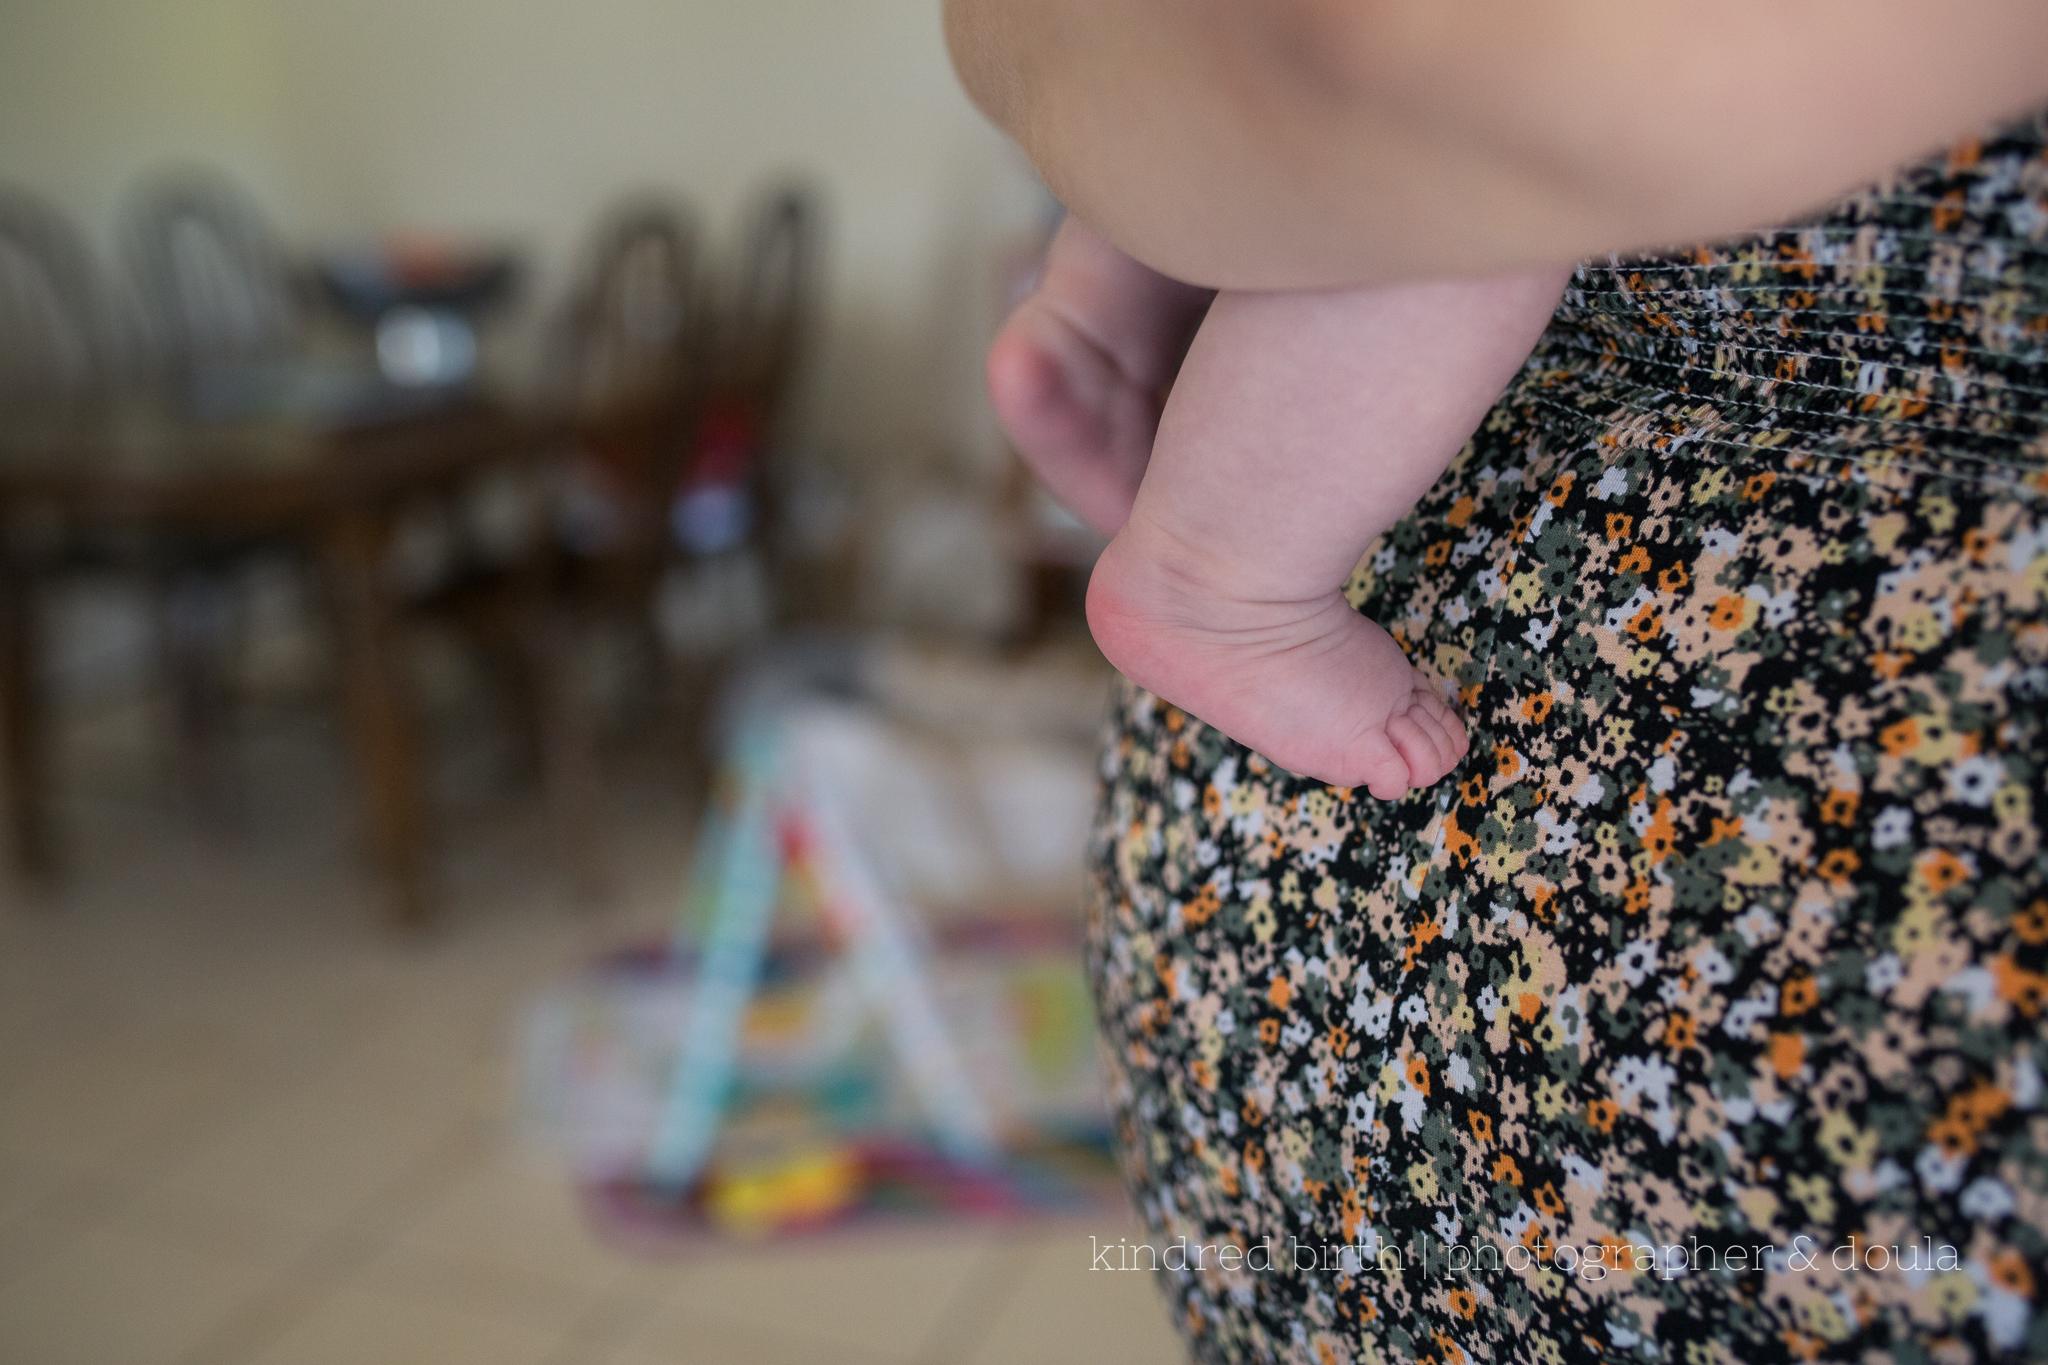 Kindred Birth - Gemma & Jamie family-9.jpg